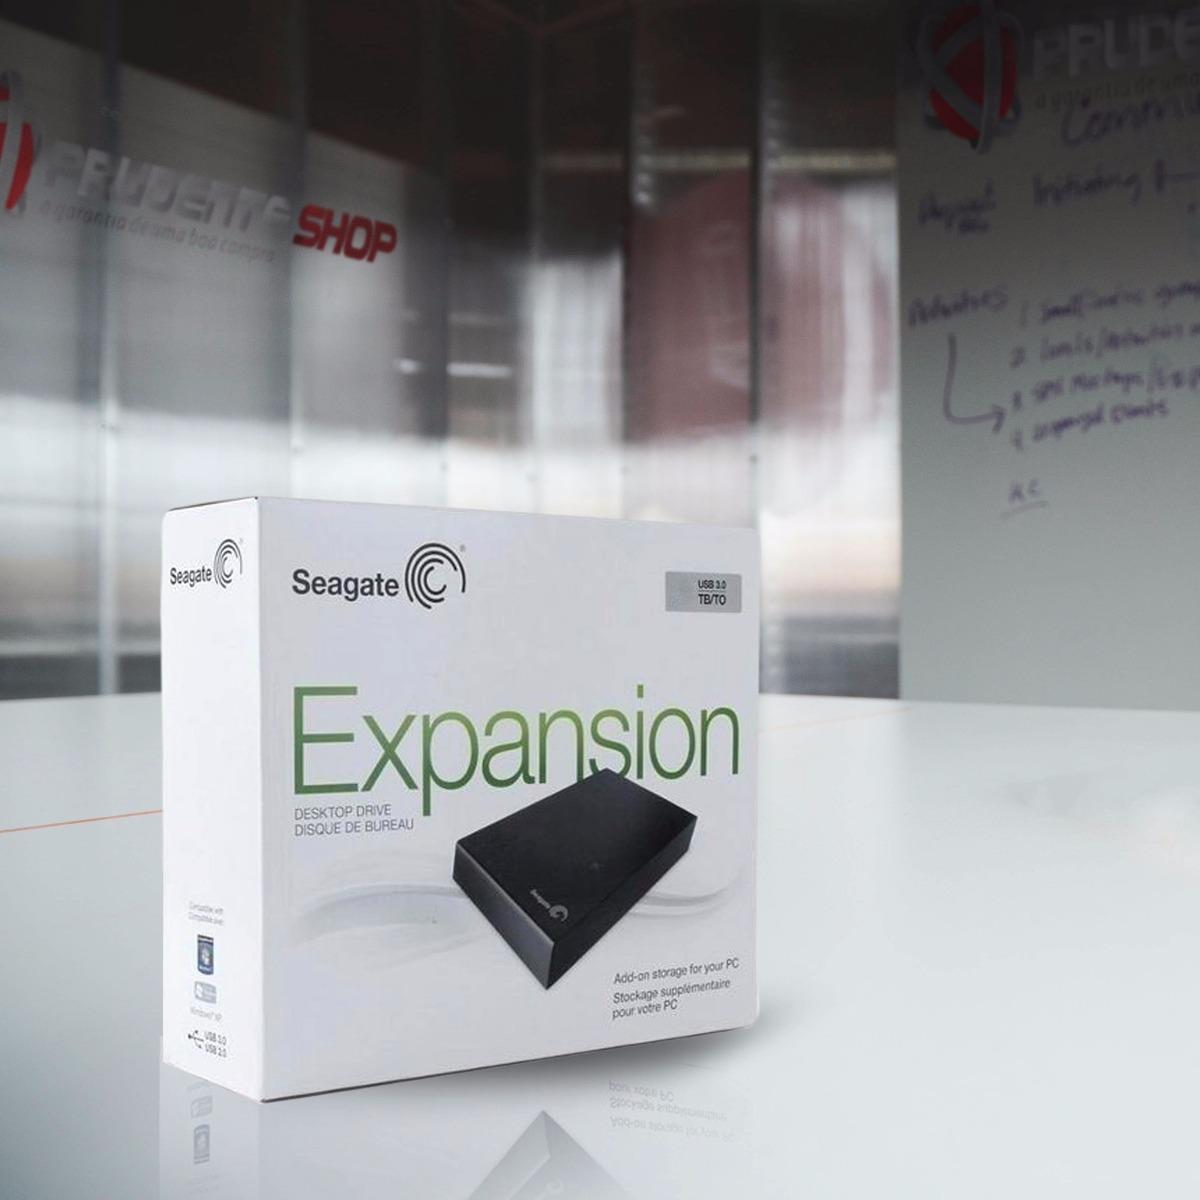 Hd Externo Seagate 2tb 2 Tera Expansion Usb 3 0 E 2 0 Novo